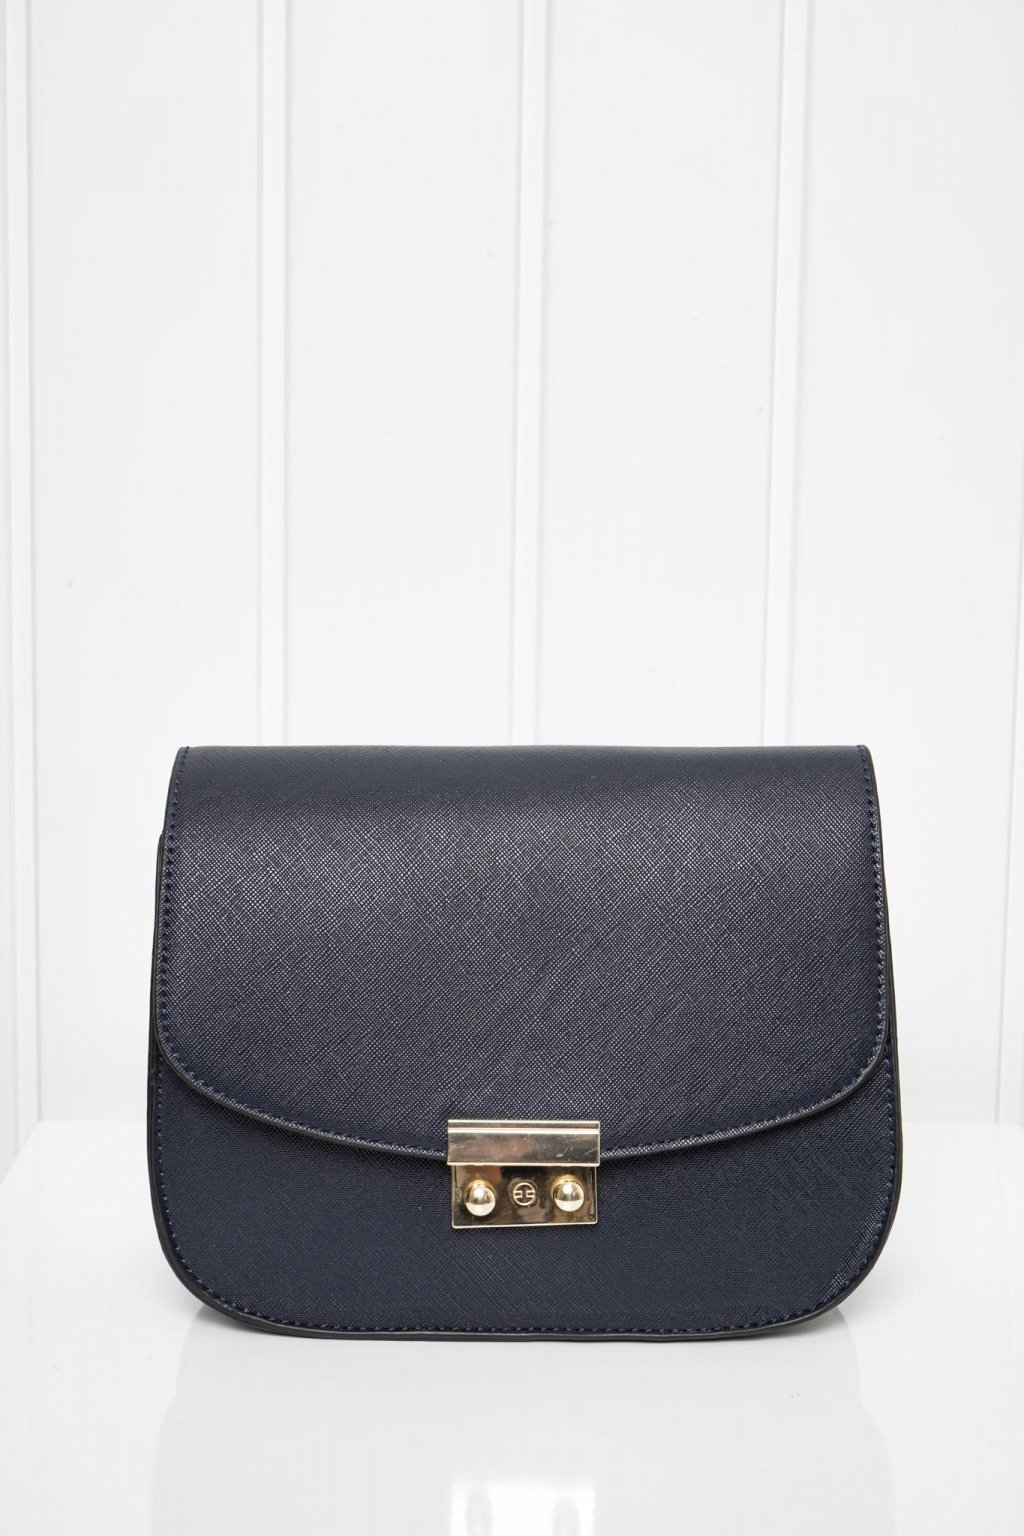 Kabelka, crossbody, ruksak, shopping bag, shopperka, 202